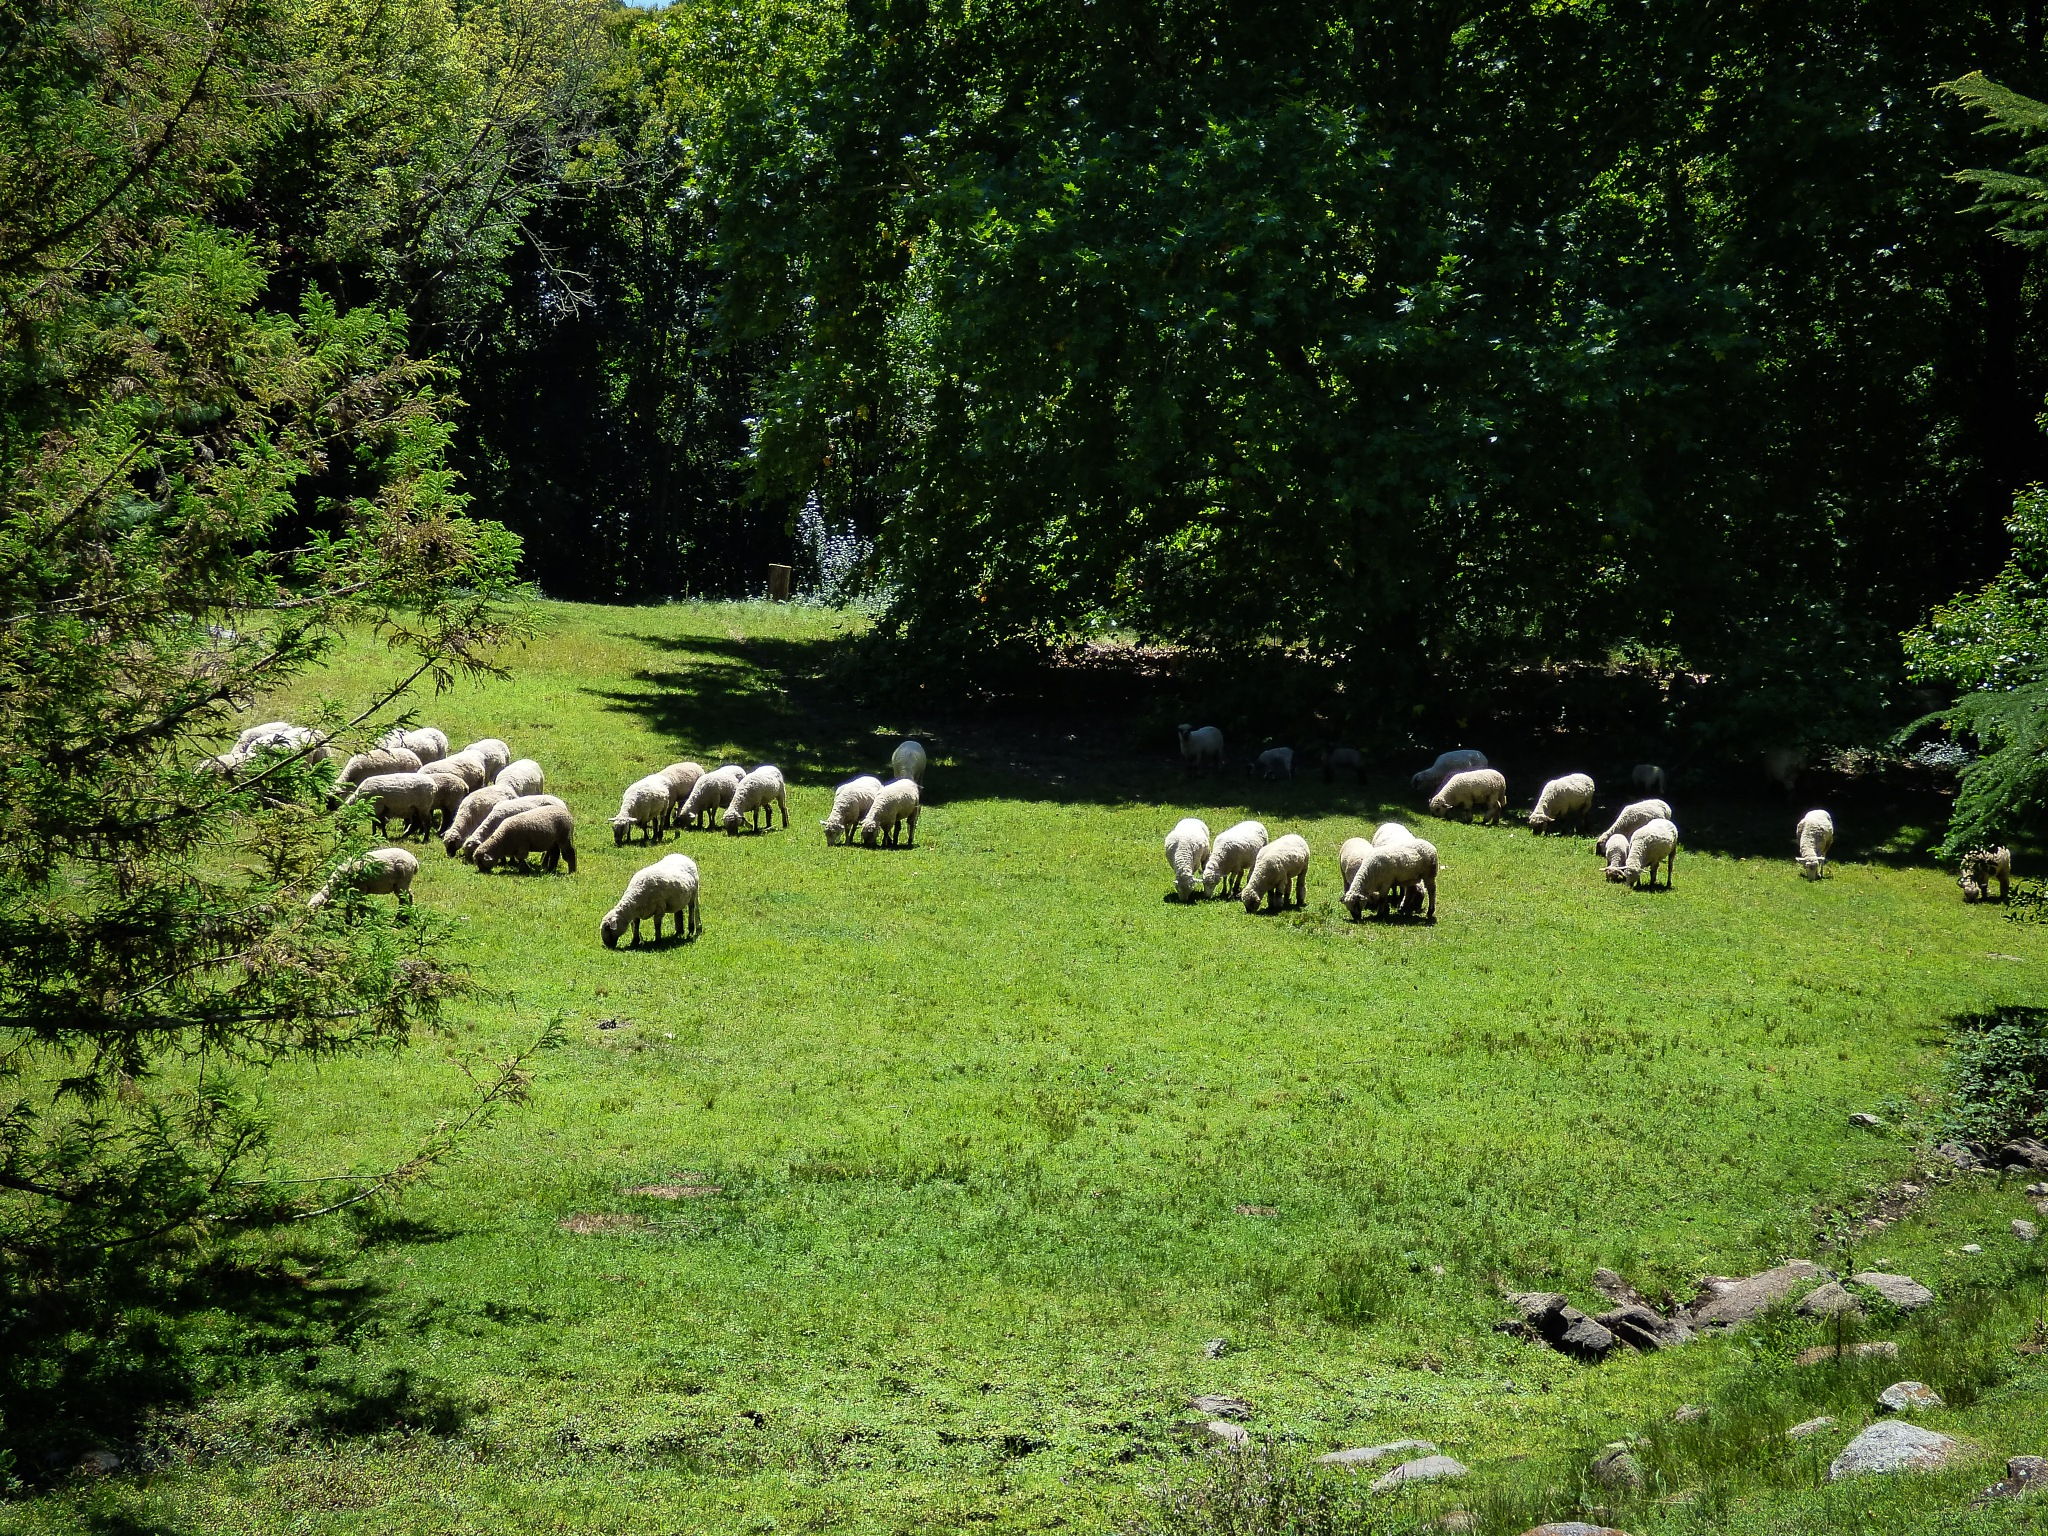 Sheep grazing by Roberto Justo Robiolo